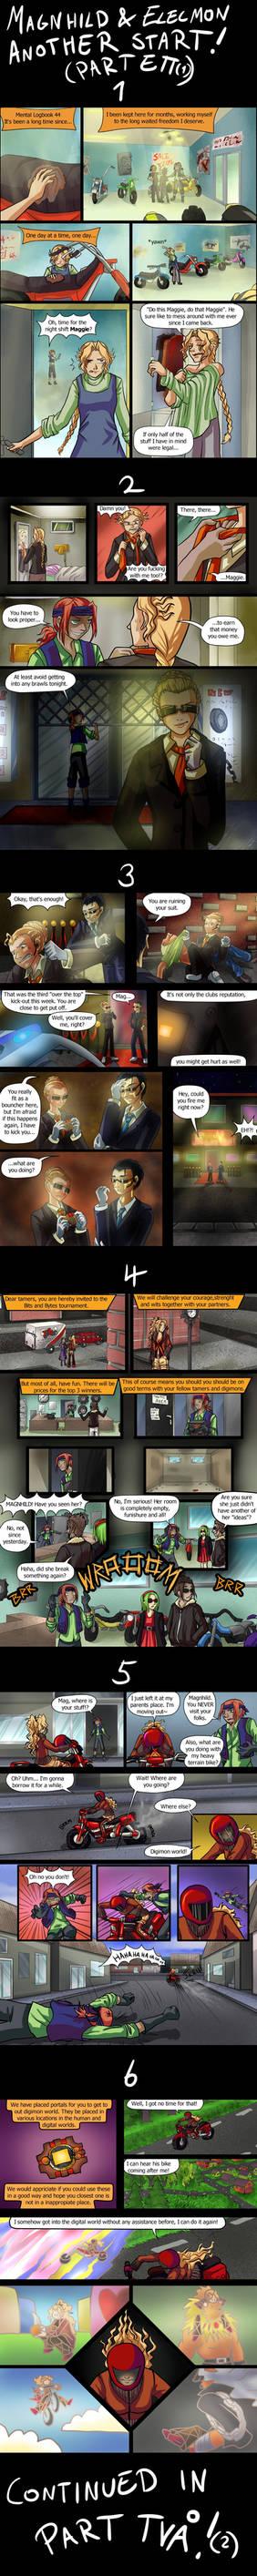 Magnhild and Elecmon: Another Start Part ETT! (1)